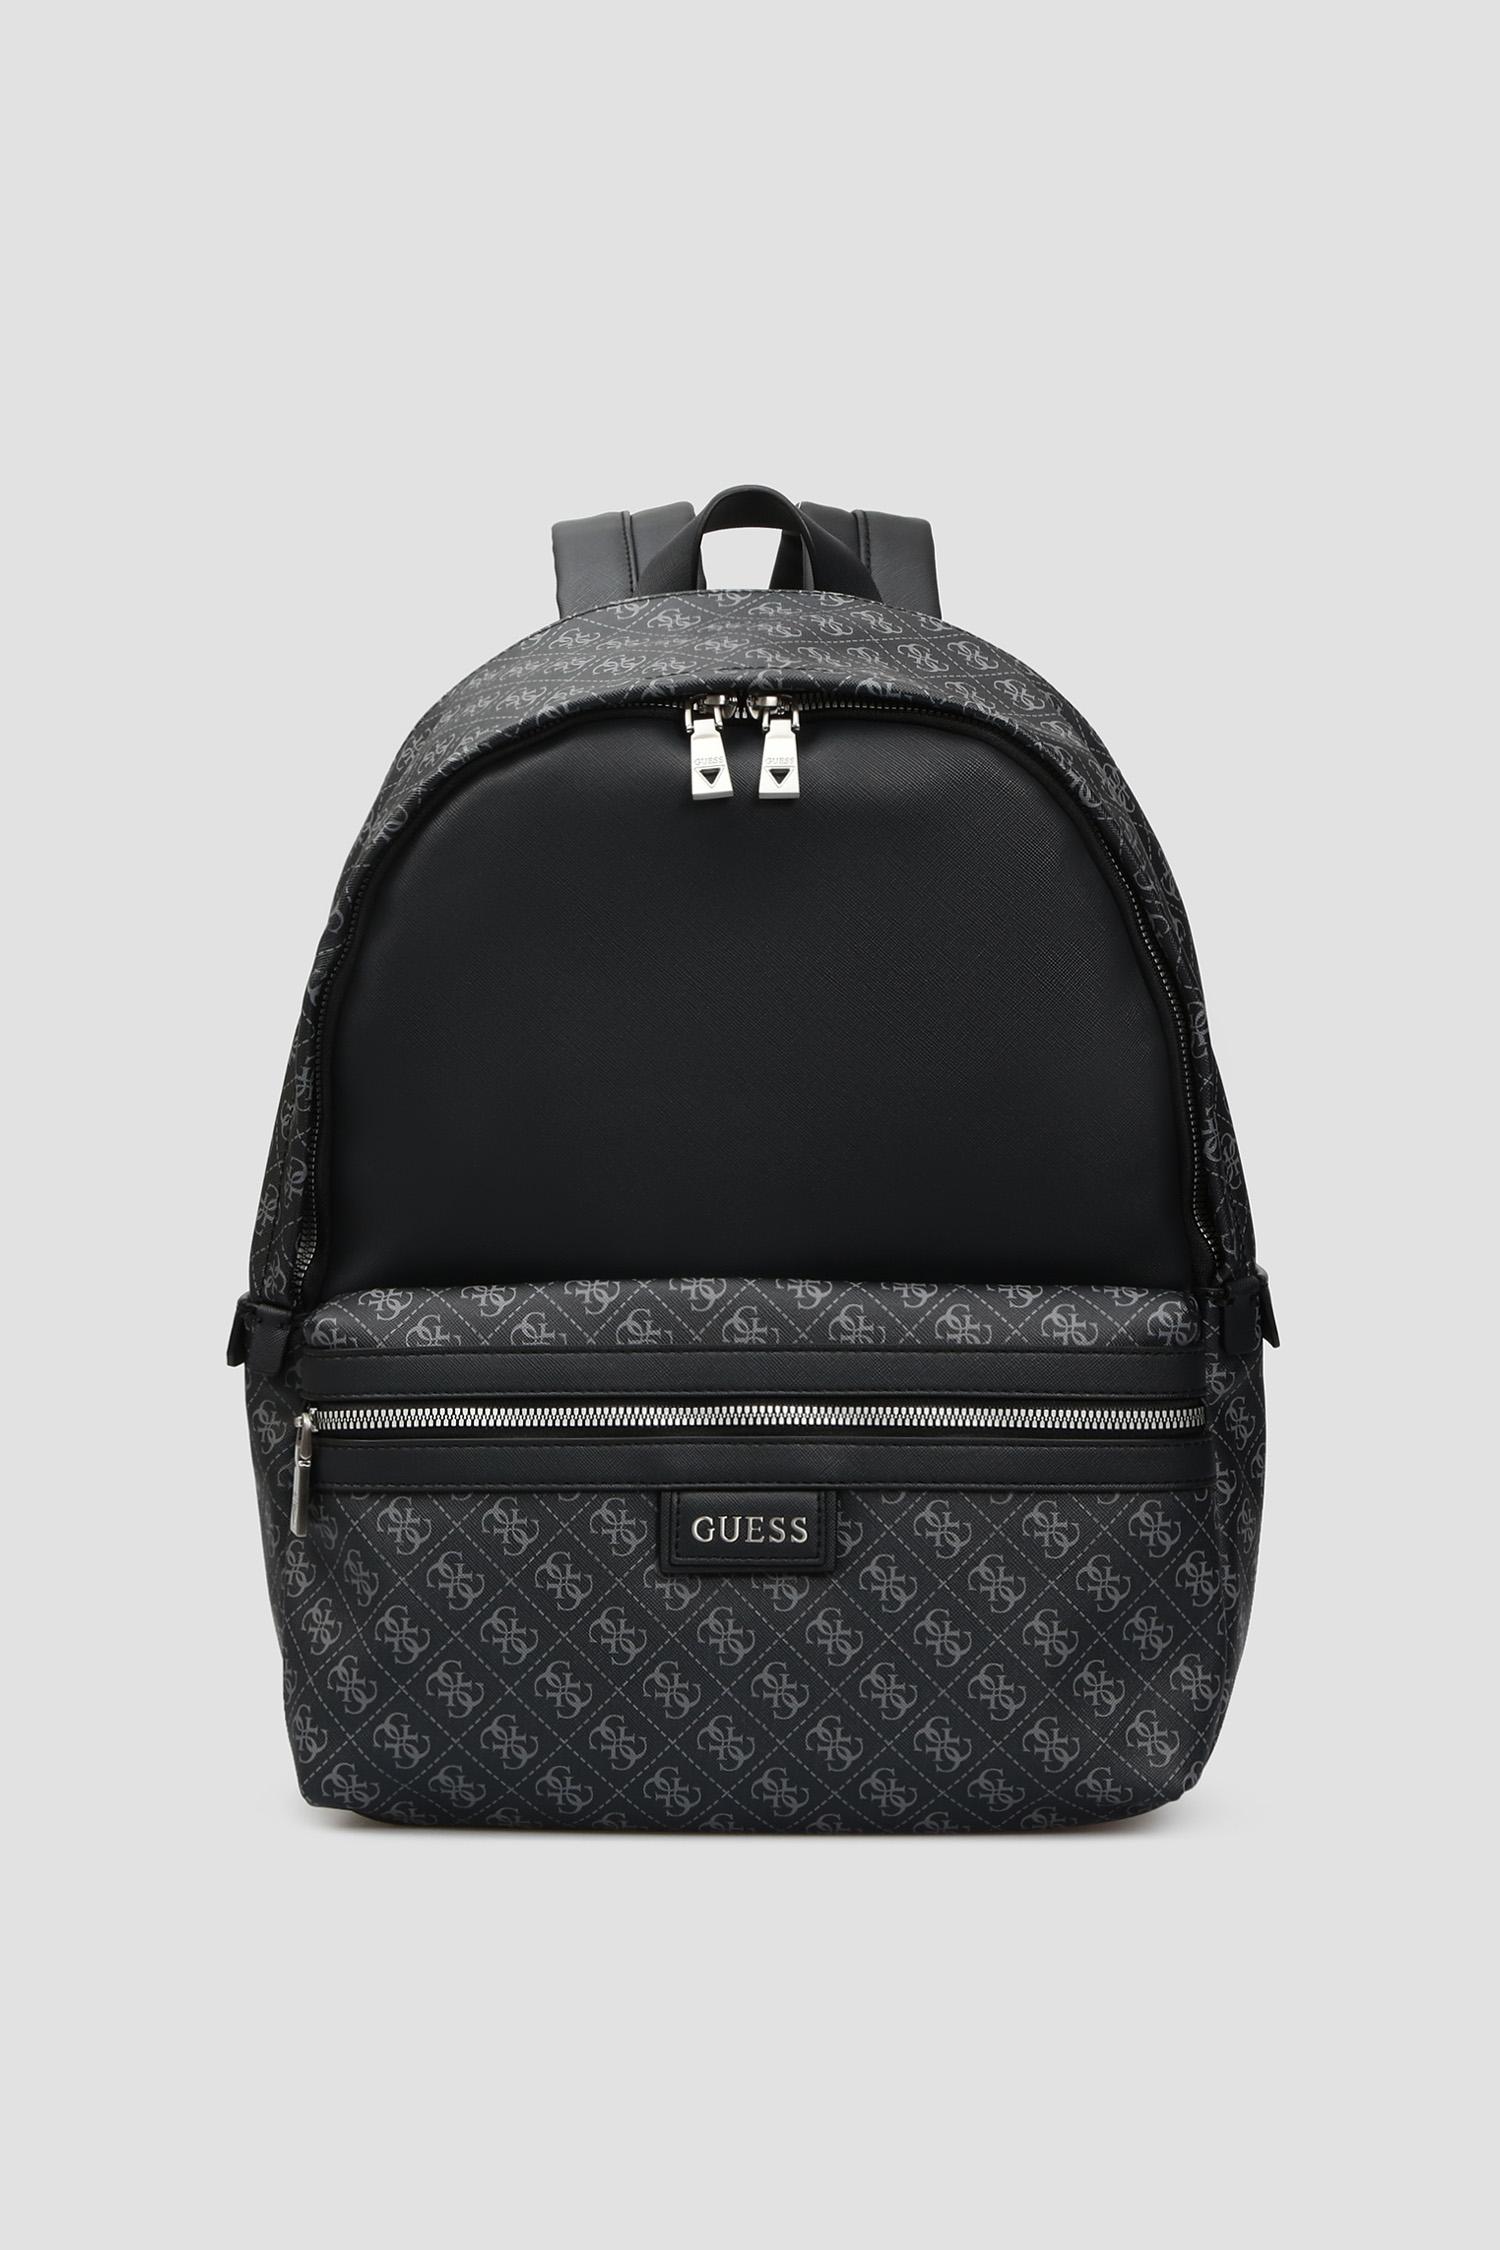 Темно-серый рюкзак для парней Guess HMDANL.P0305;BLA